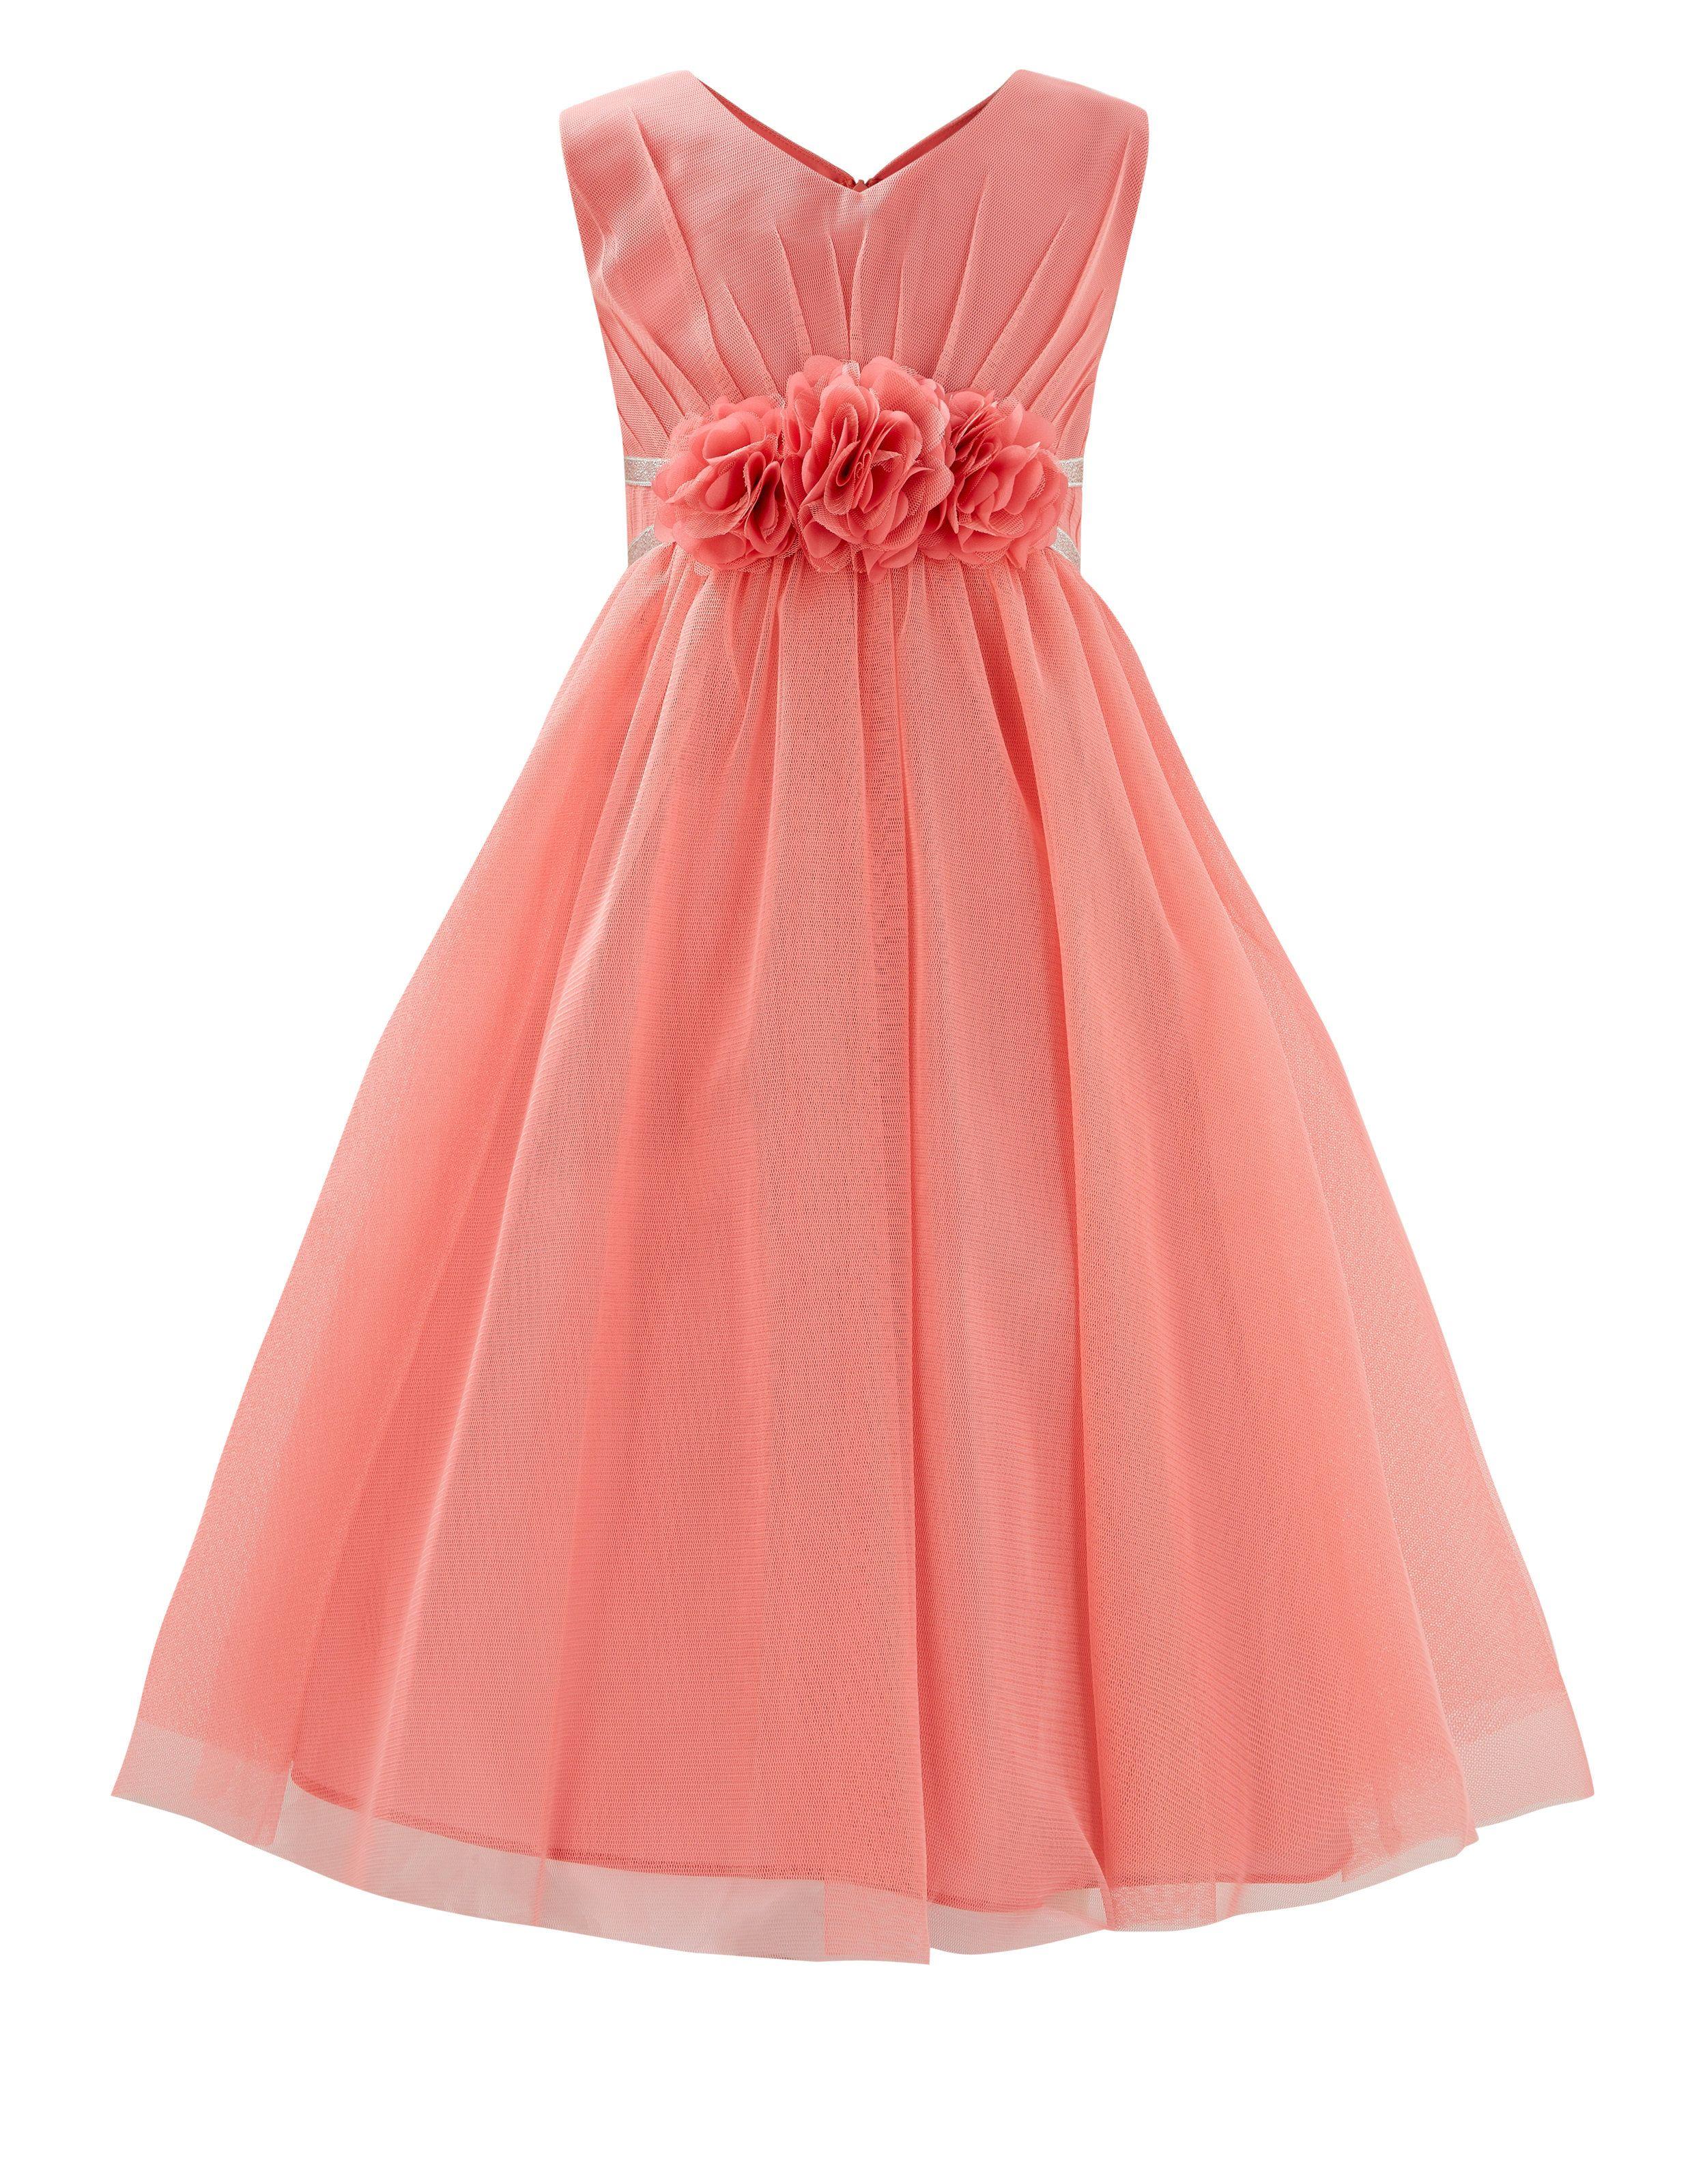 Платье Sibbe Corsage | Розовый | Monsoon | Children\'s fashion for ...